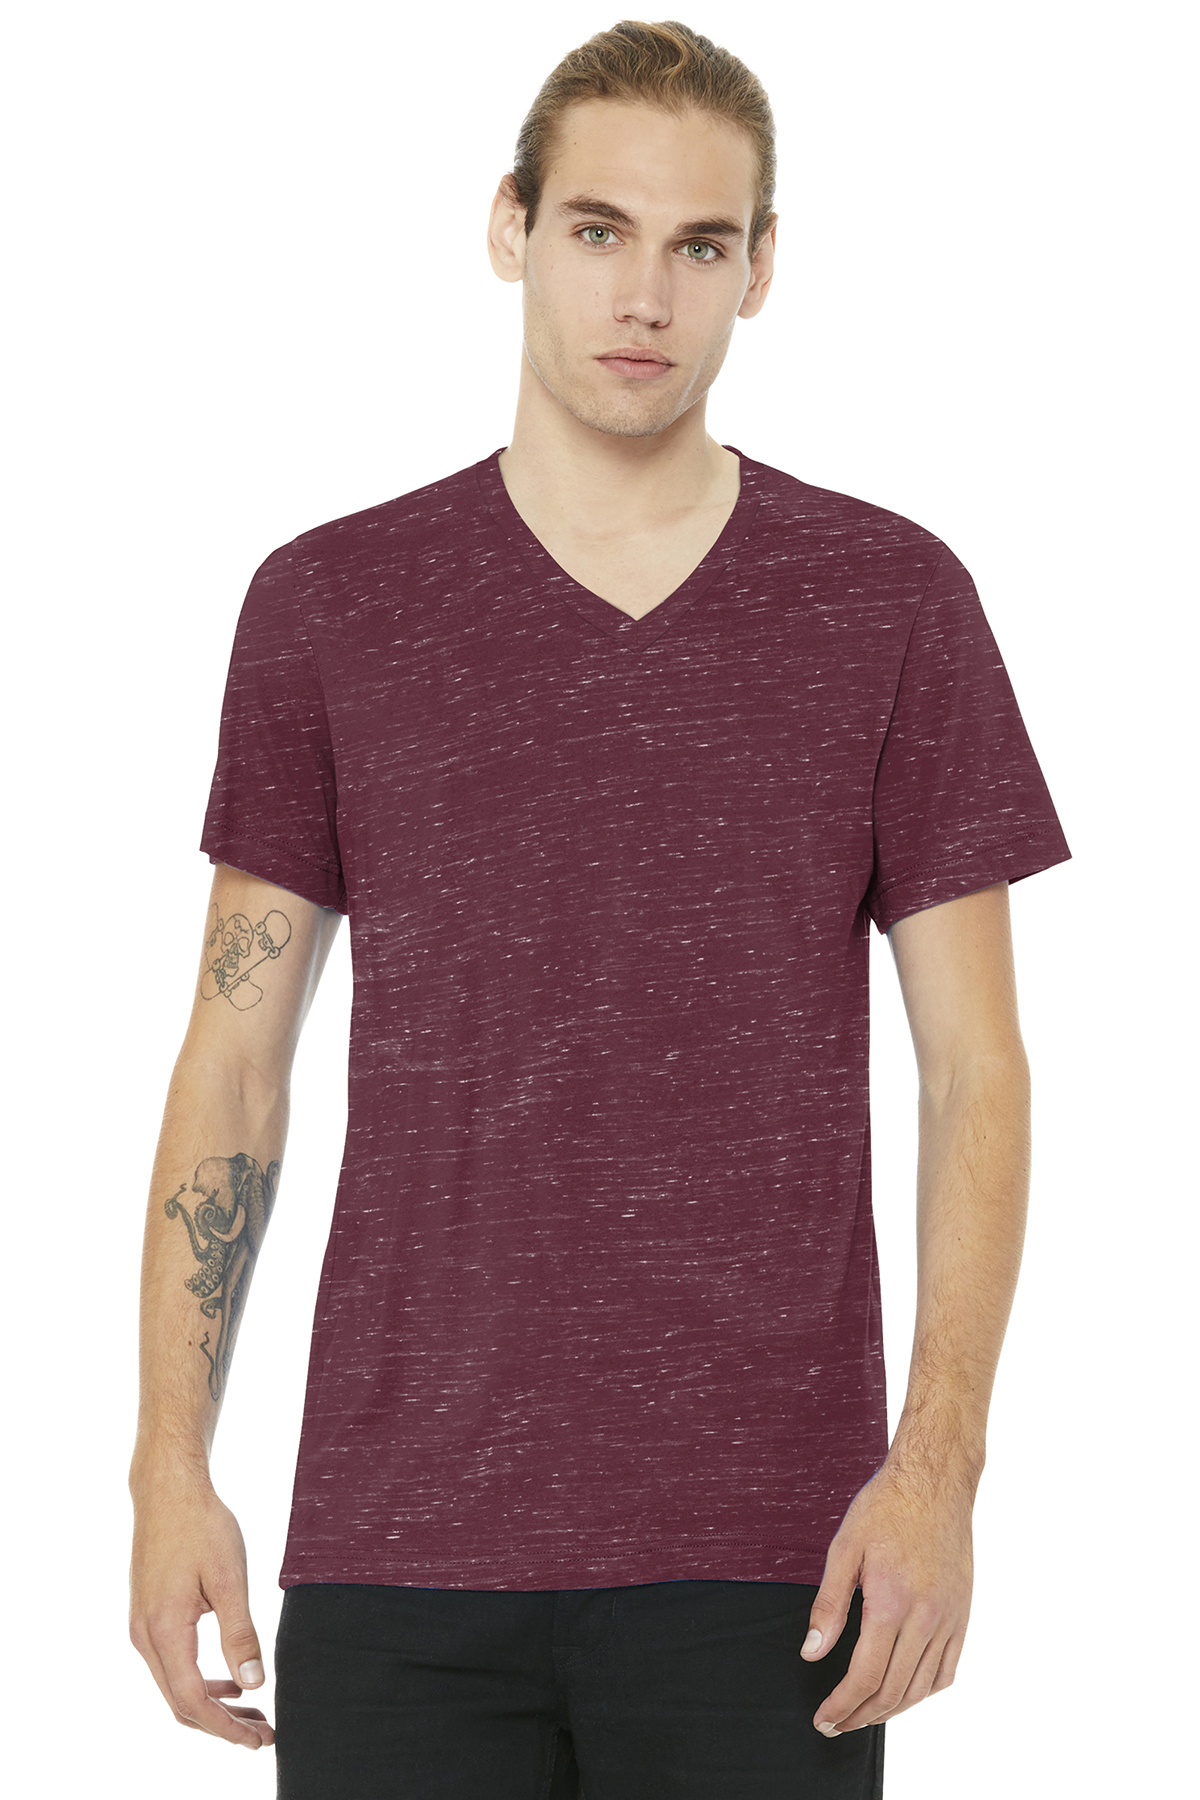 a77954e7 BELLA+CANVAS ® Unisex Jersey Short Sleeve V-Neck Tee | Adult ...